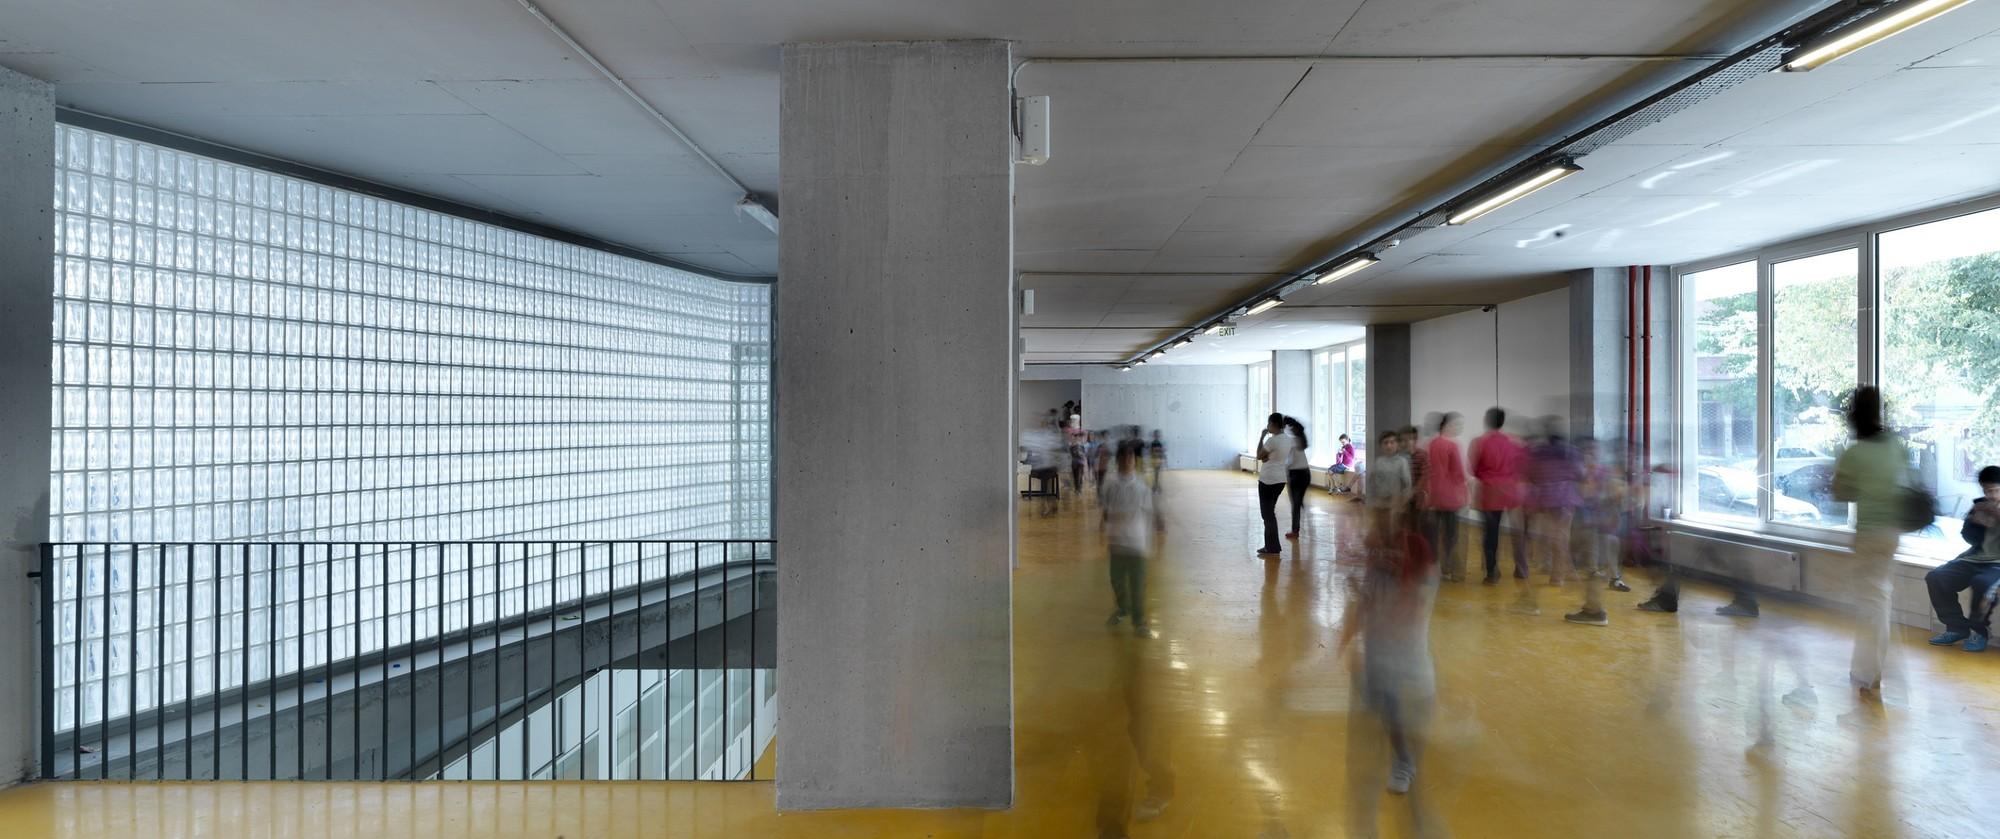 NEF Primary School / CINICI Architects, © Cemal Emden